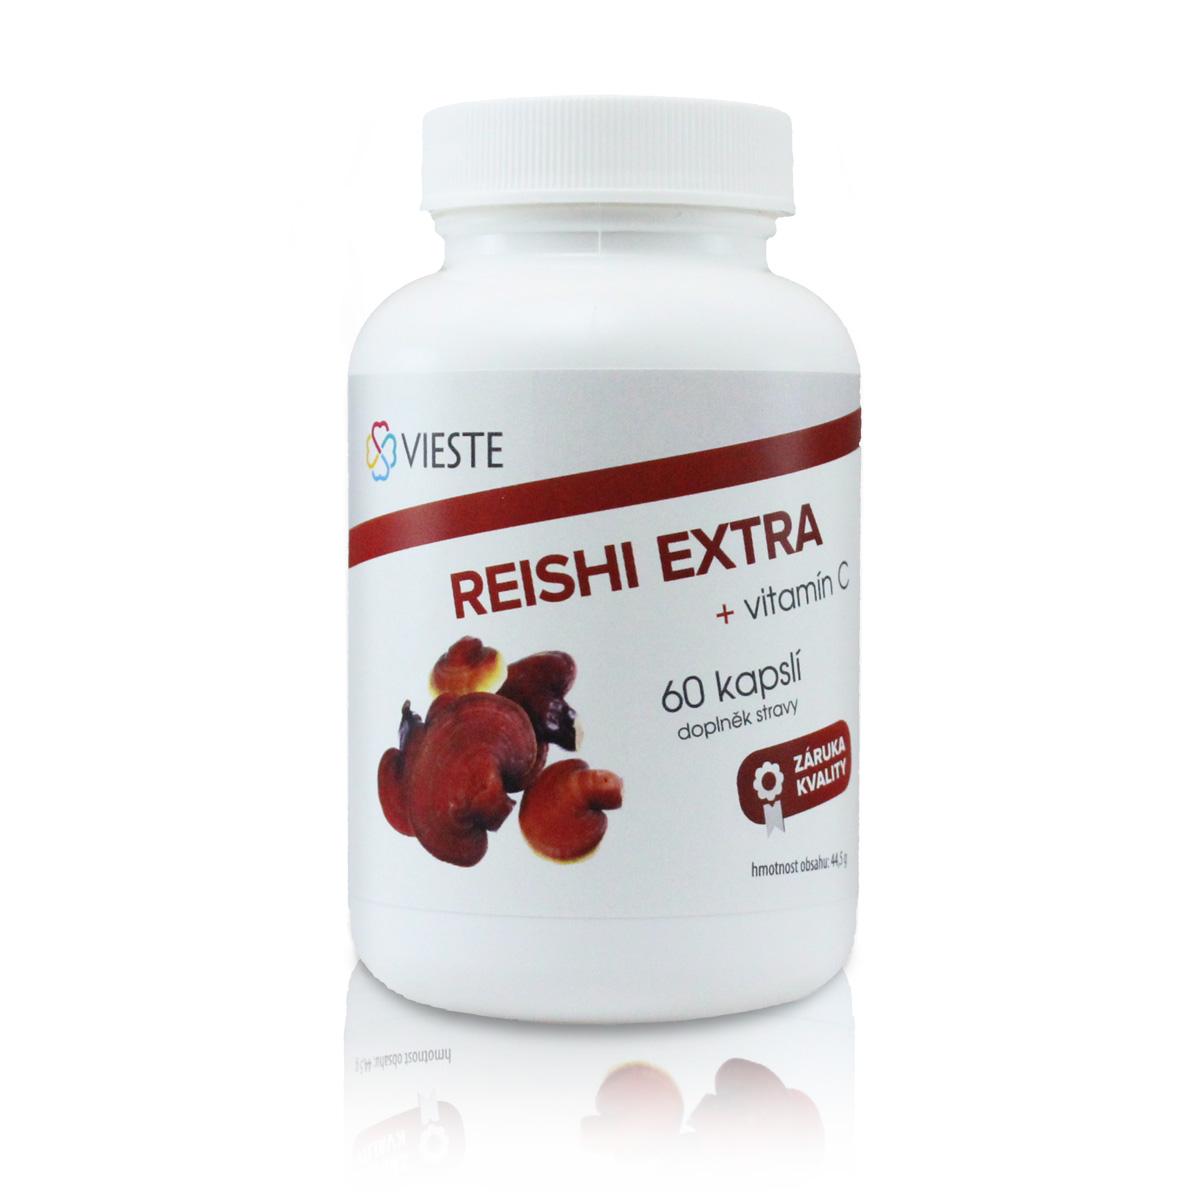 Vieste Reishi extra 60 cps